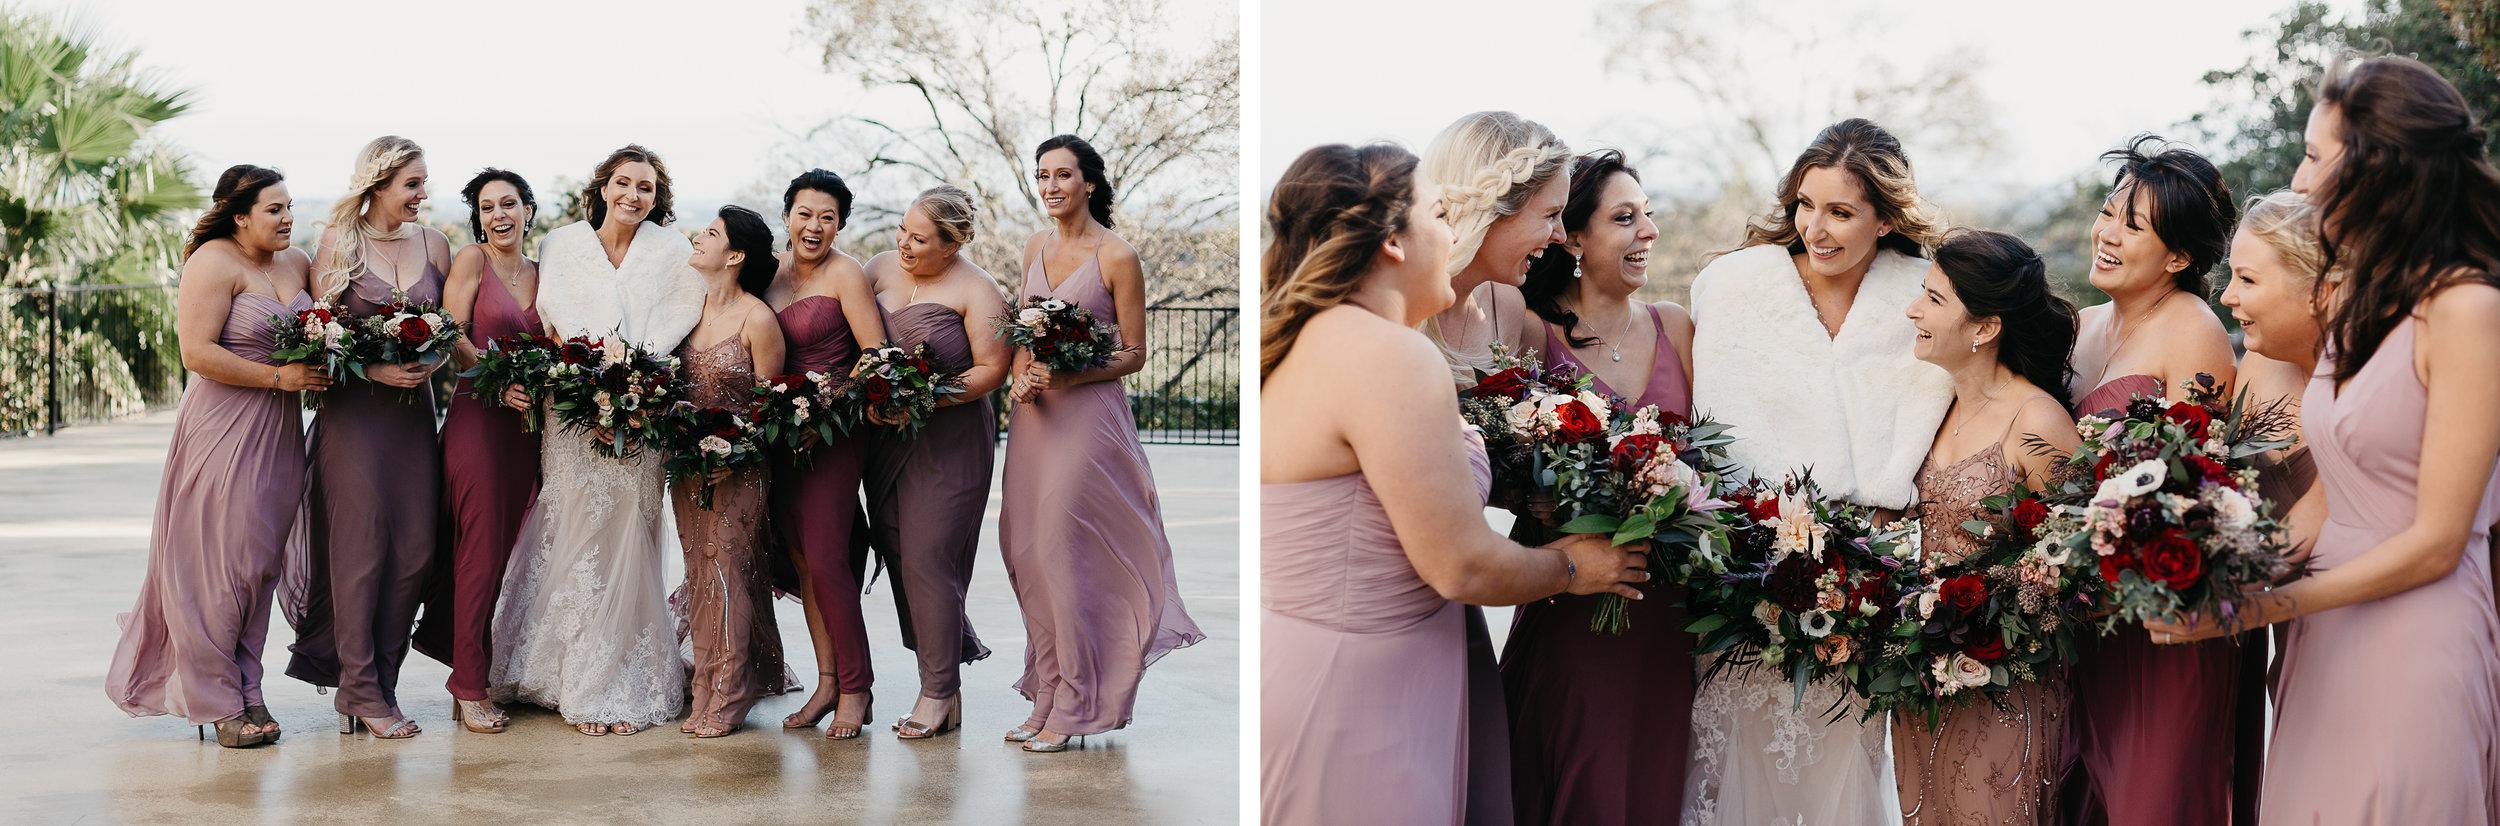 austin texas wedding photogapher elopement photographer villa antonia austin 15.jpg